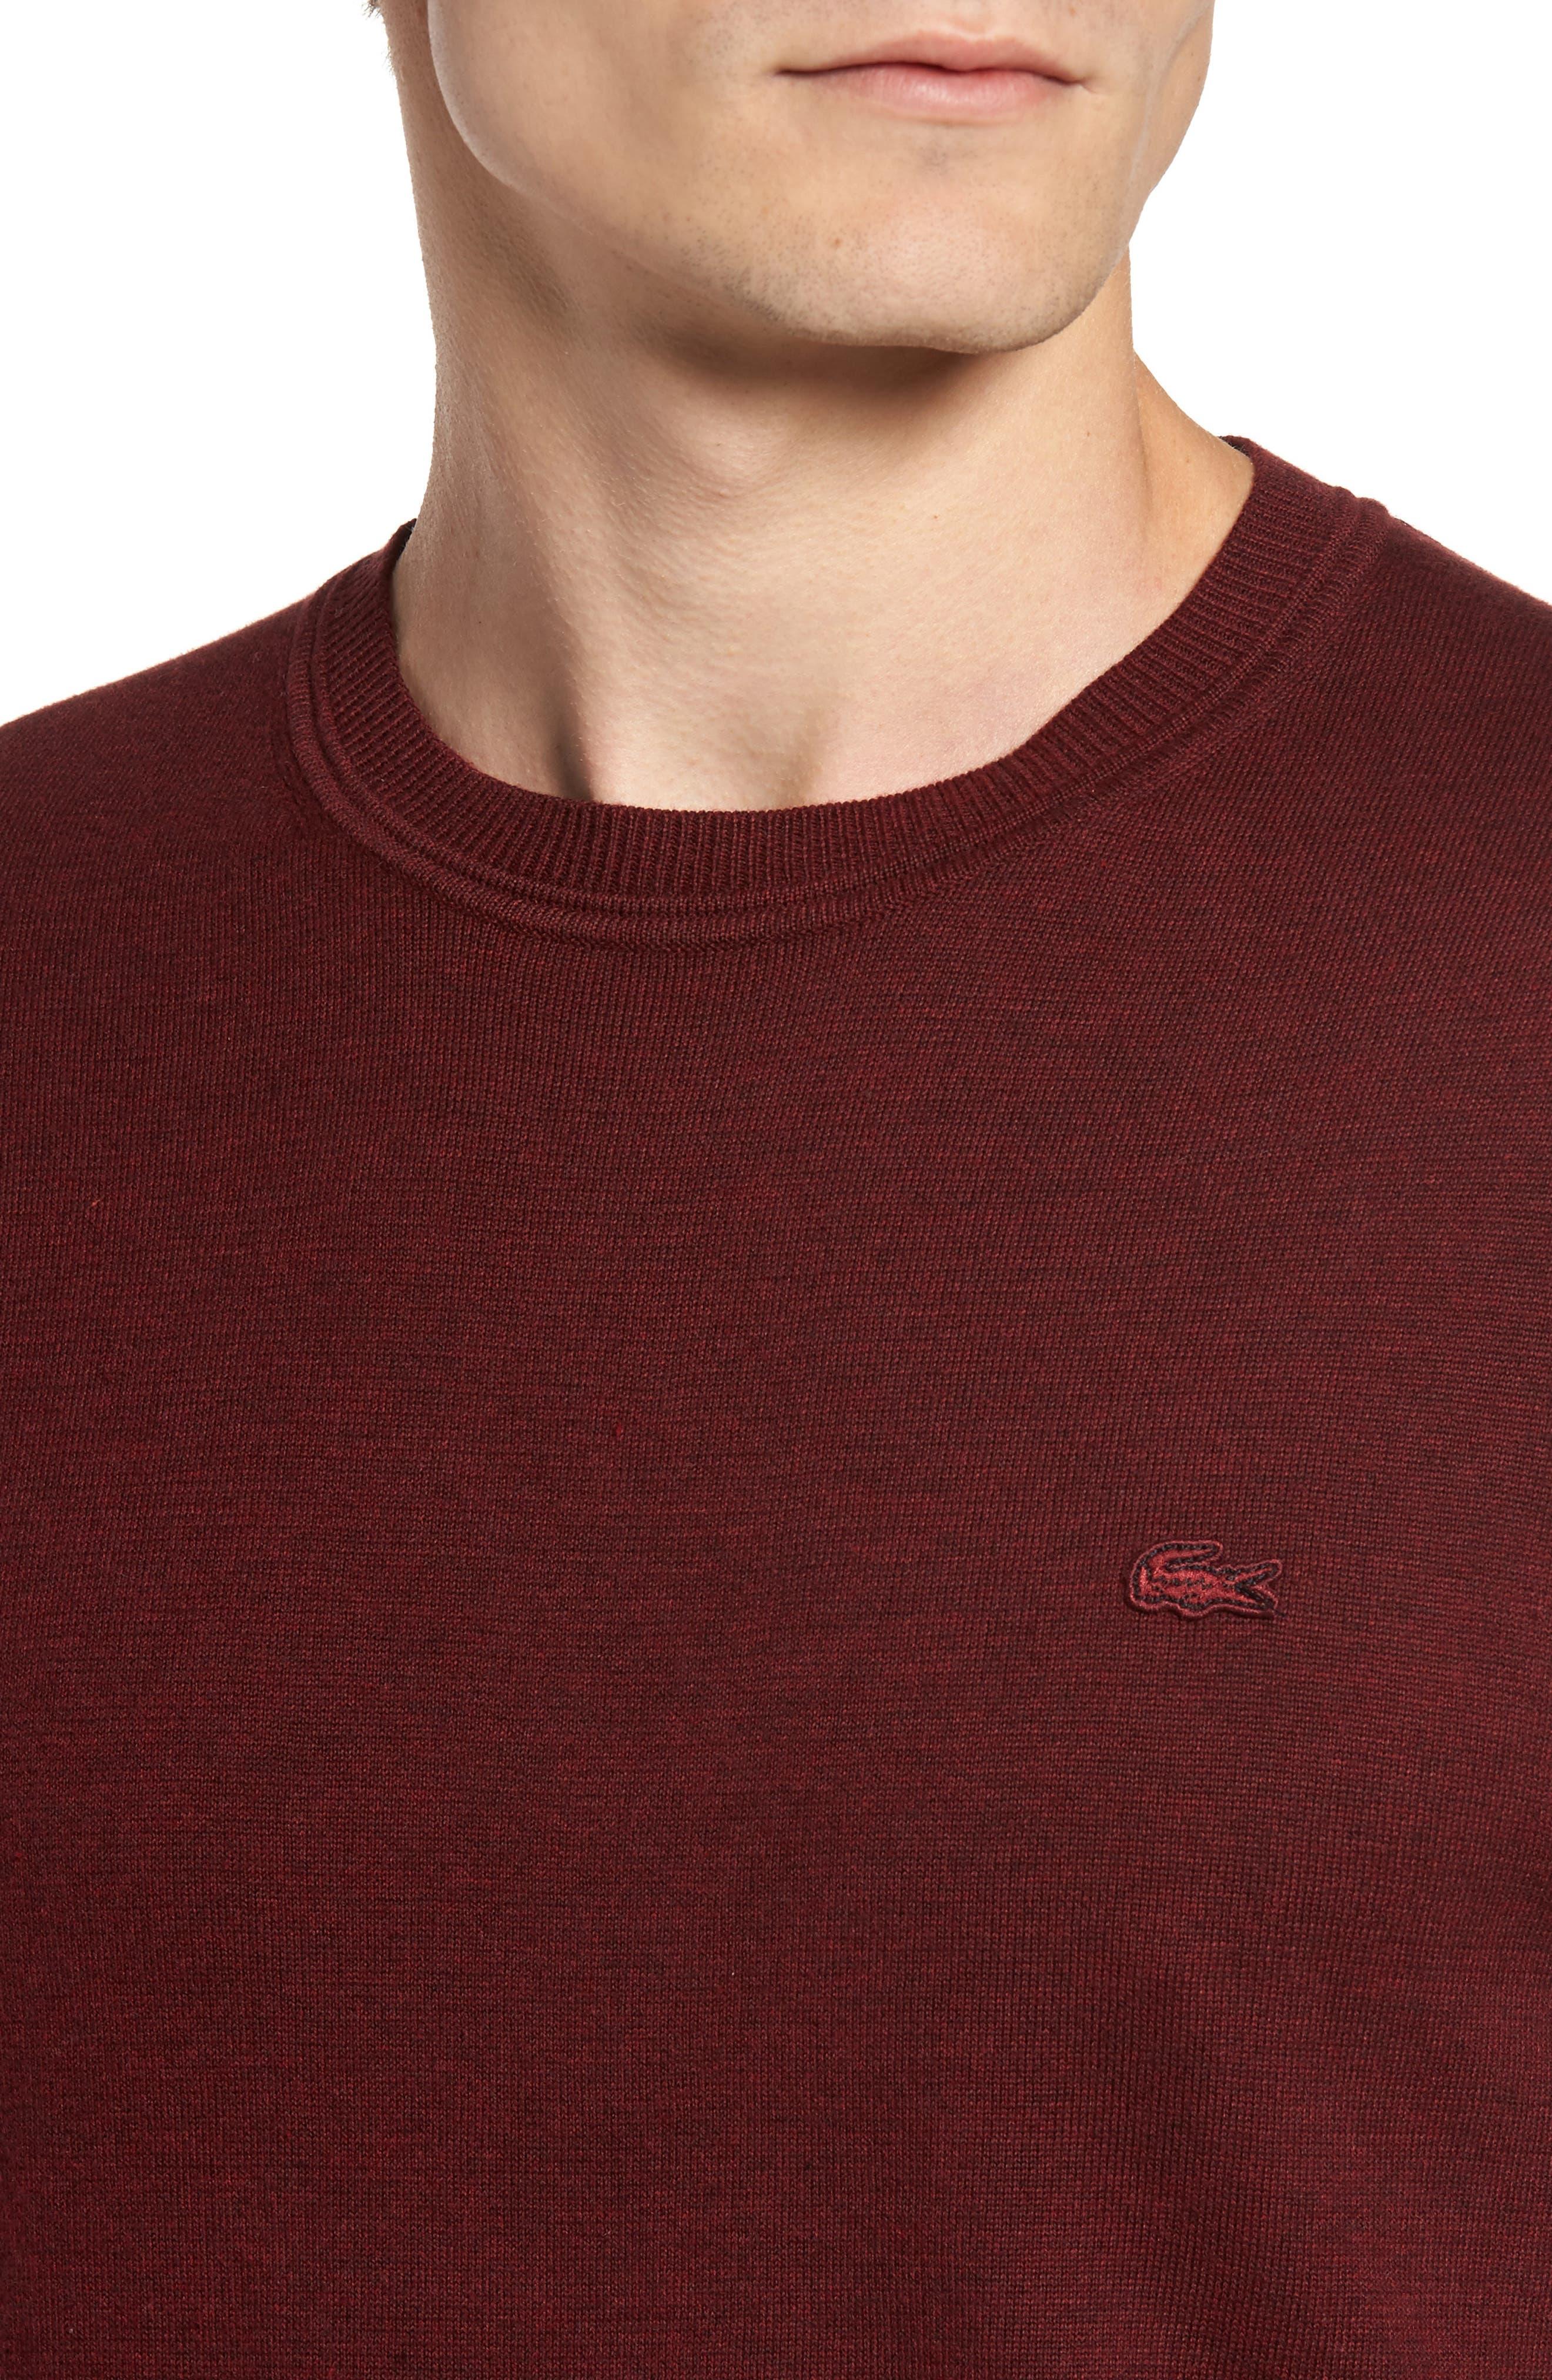 Alternate Image 4  - Lacoste Jersey Knit Crewneck Sweater